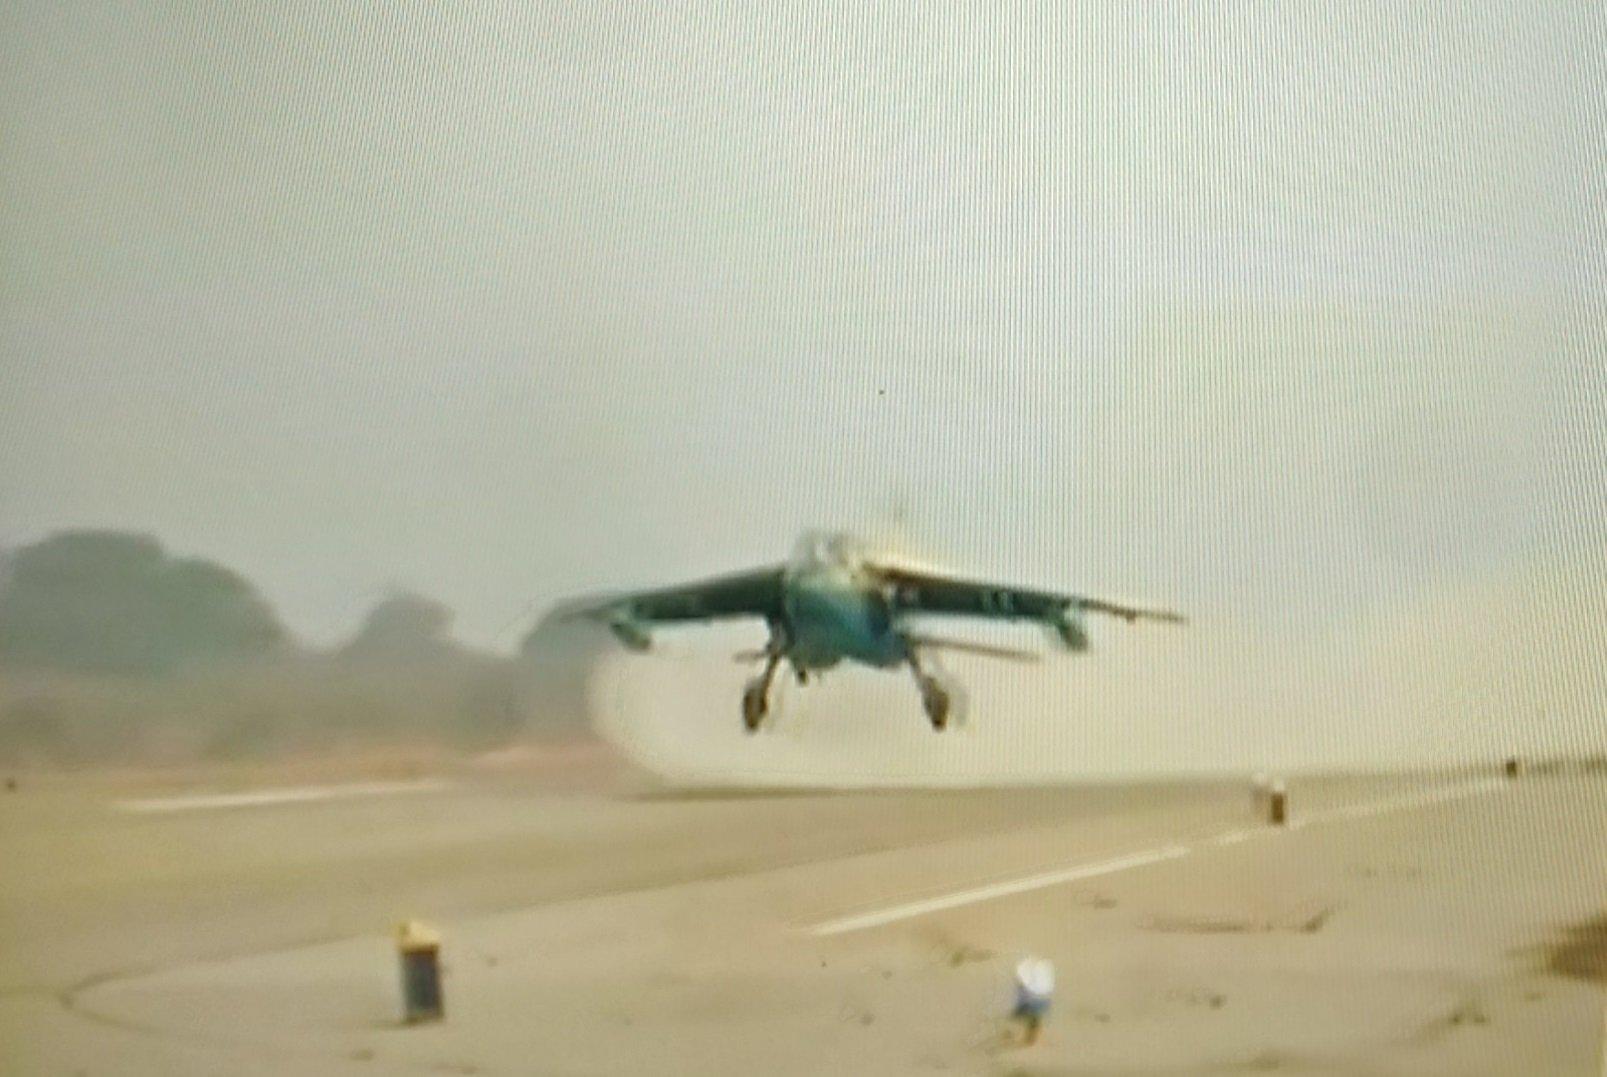 Aereo Da Combattimento Cinese : Armi aereo da combattimento guerra mentinfuga